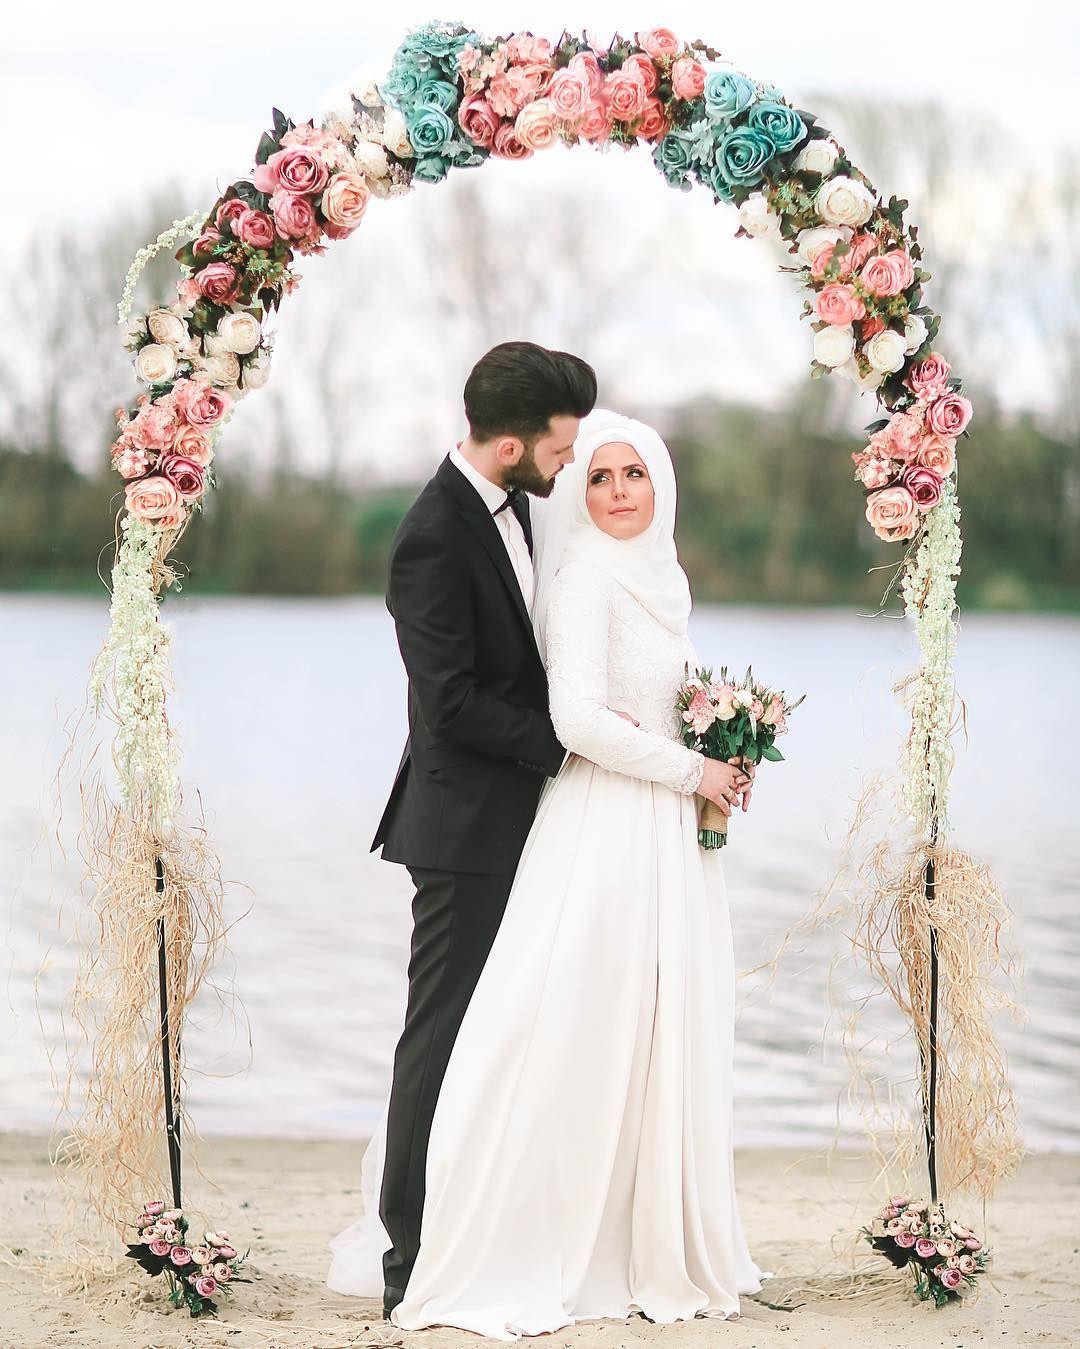 Fatima Mikail // Allah kimseyi diş ağrısıyla imtihan etmesin info ...